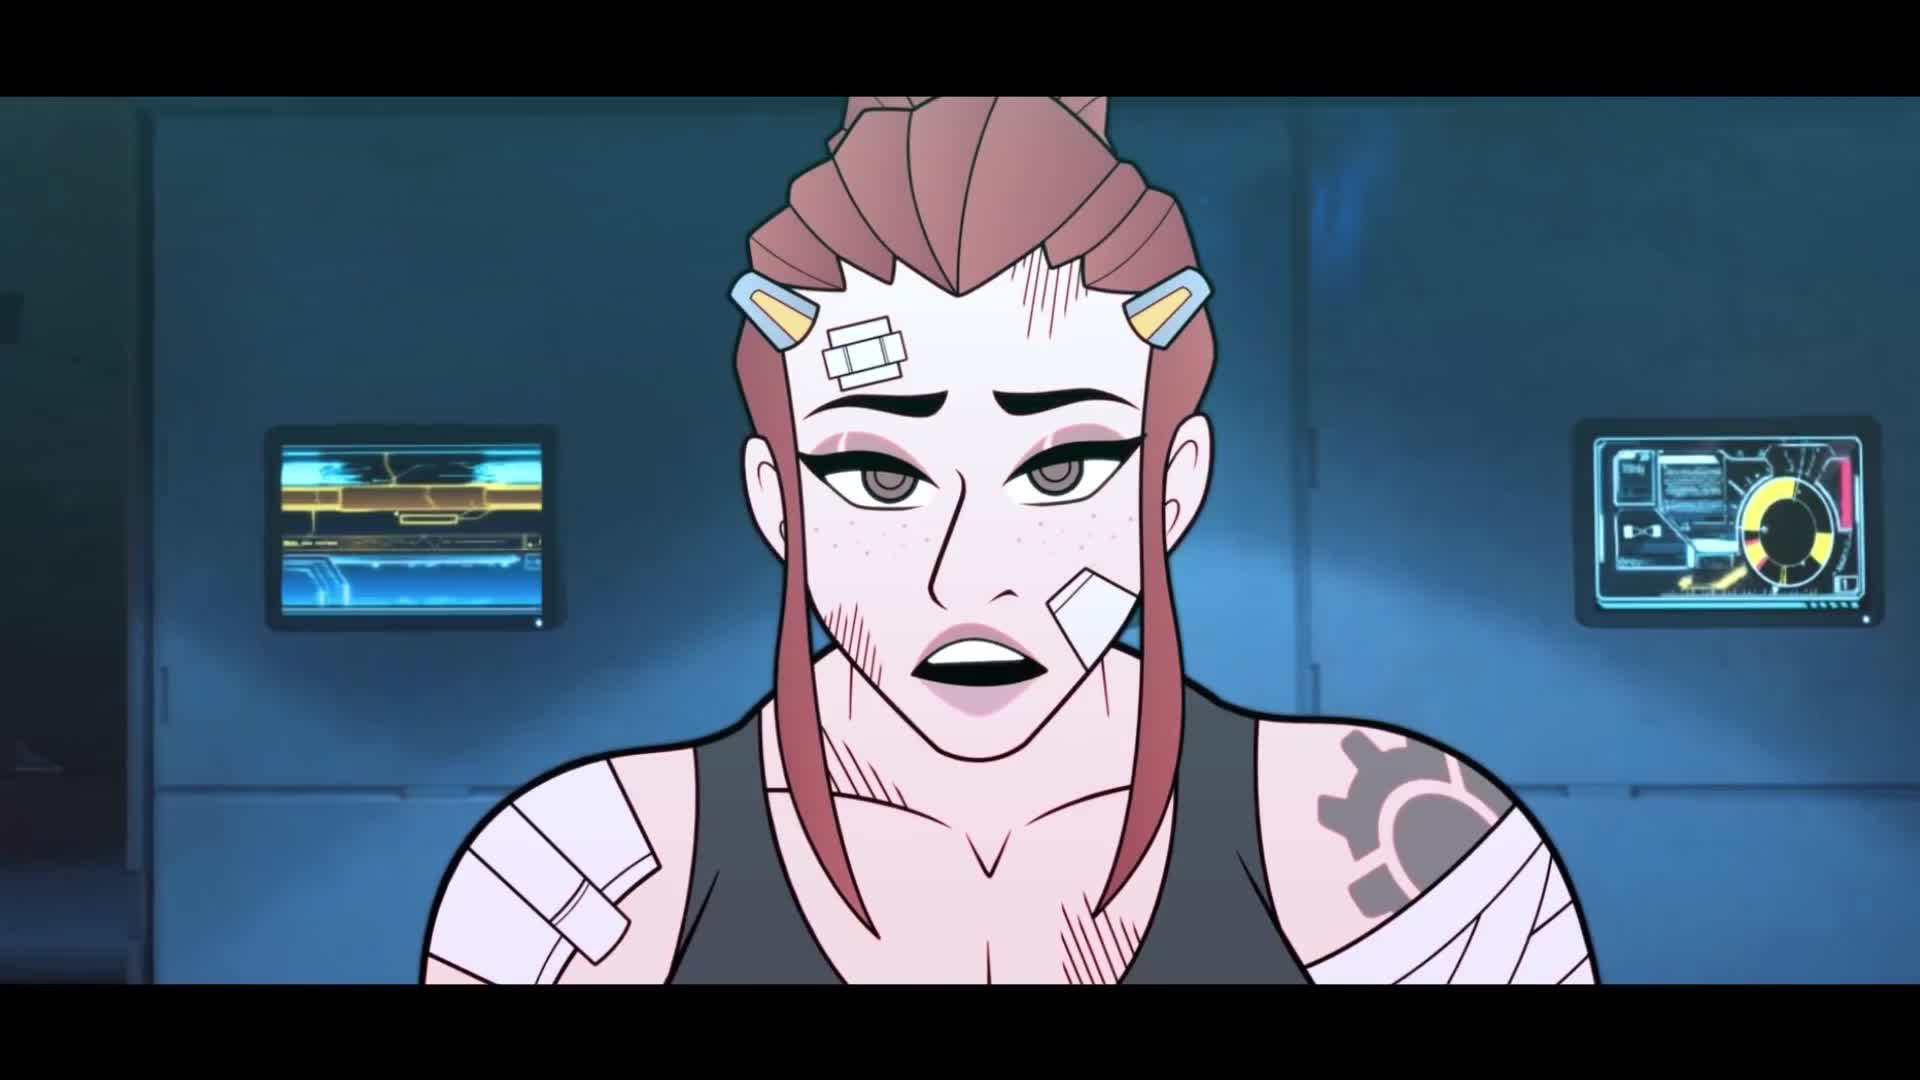 Brigitte, Brigitte Lindholm, Cartoon, Overwatch, animated, animation, gaming, Brigitte Gets Nerfed: Overwatch Animated GIFs